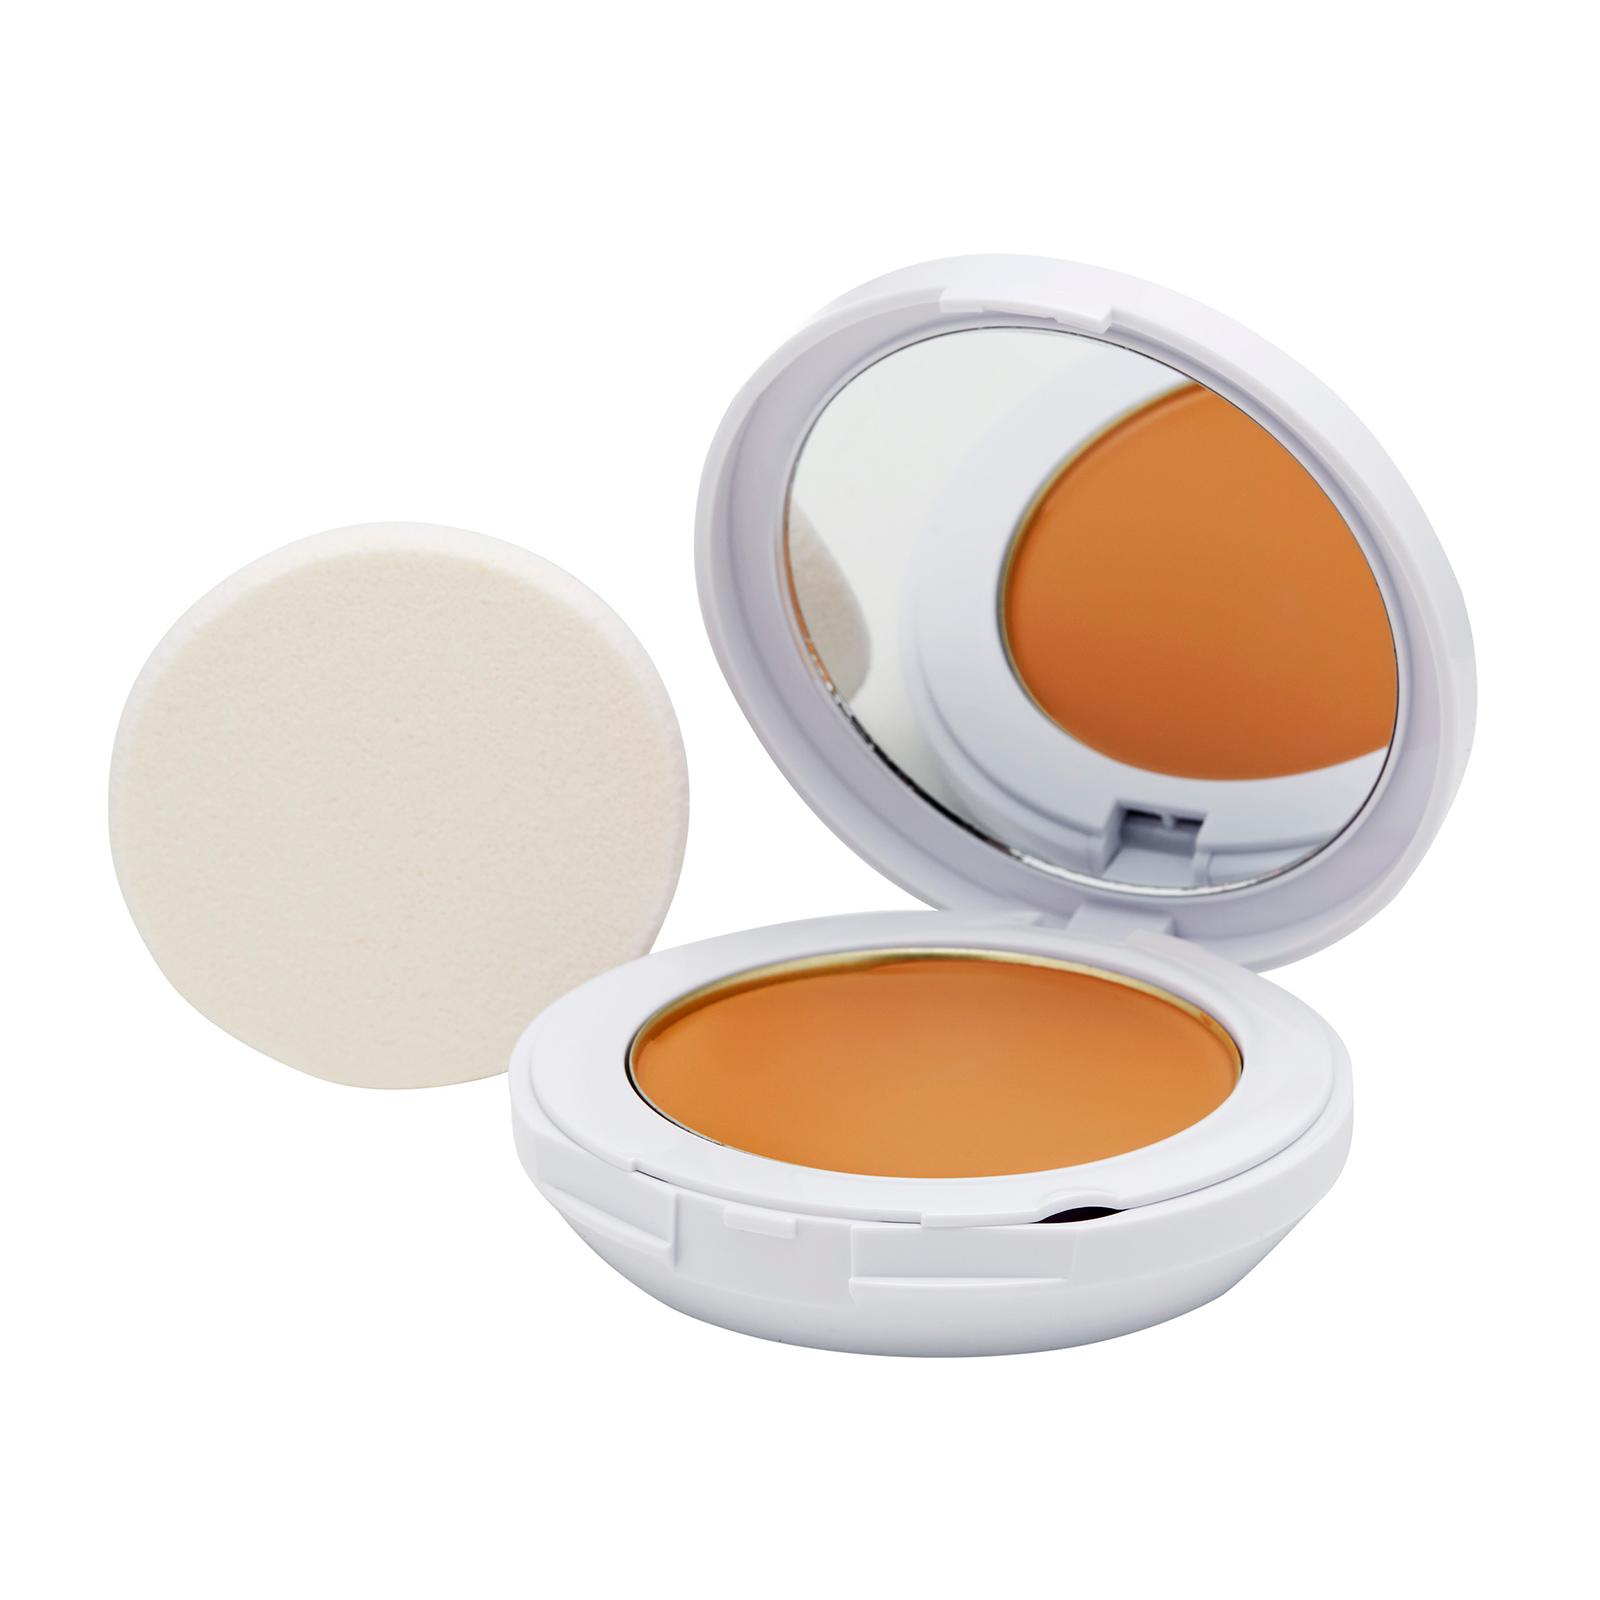 Embryolisse  Artist Secret Compact Foundation Cream SPF 20 Tanned , 9g,